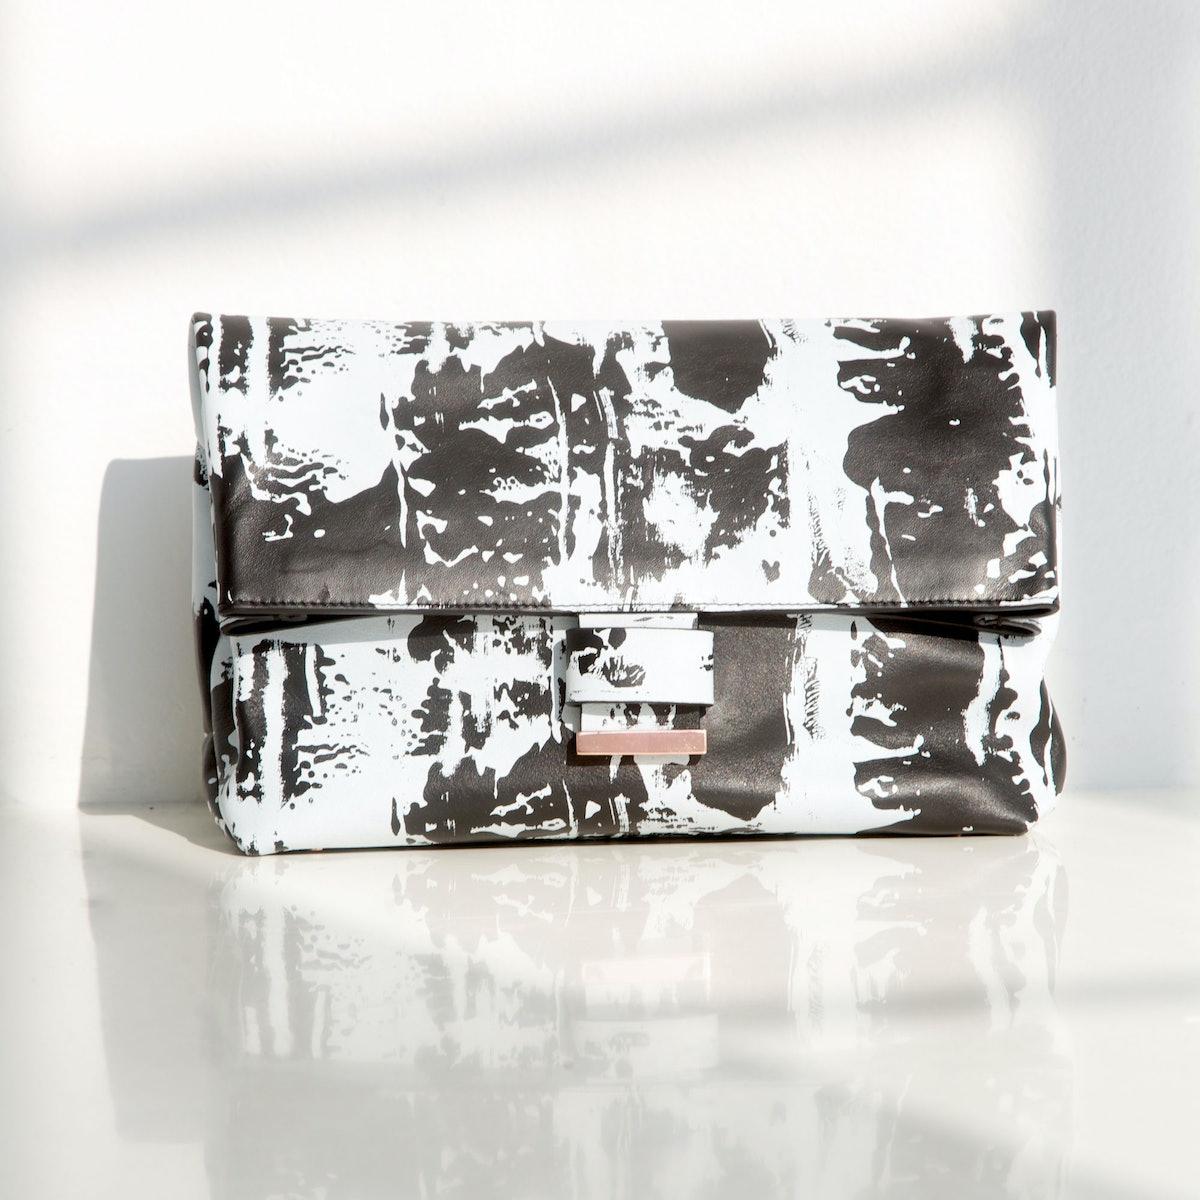 Cédric Charlier multicolored clutch, $595, [shopbop.com](http://www.shopbop.com/multi-colored-clutch-cedric-charlier/vp/v=1/1516857067.htm?folderID=25901&fm=other-shopbysize-viewall&colorId=10917)